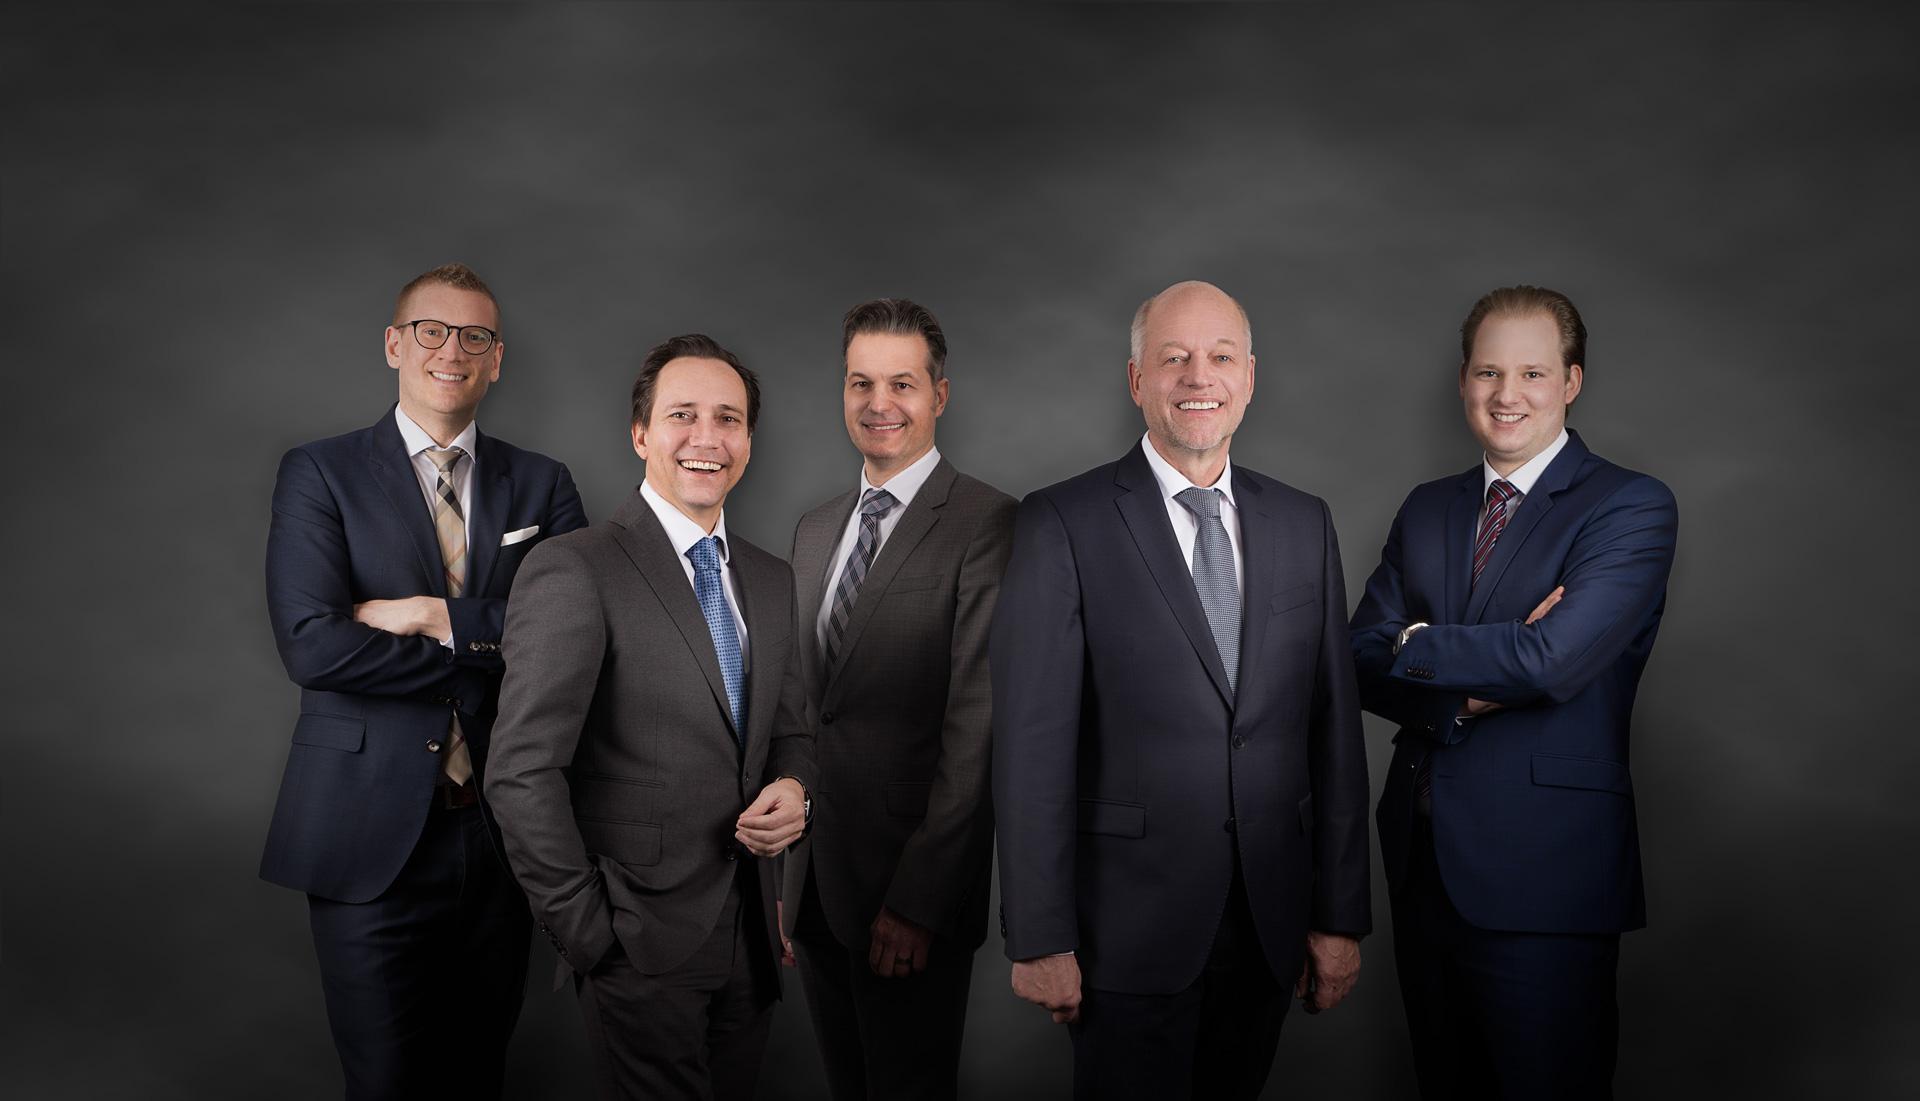 Michael Bluhm, Friedrich Schulte-Huxel, Stefan Gottwald, Stefan Mechlinski, Andreas Puls